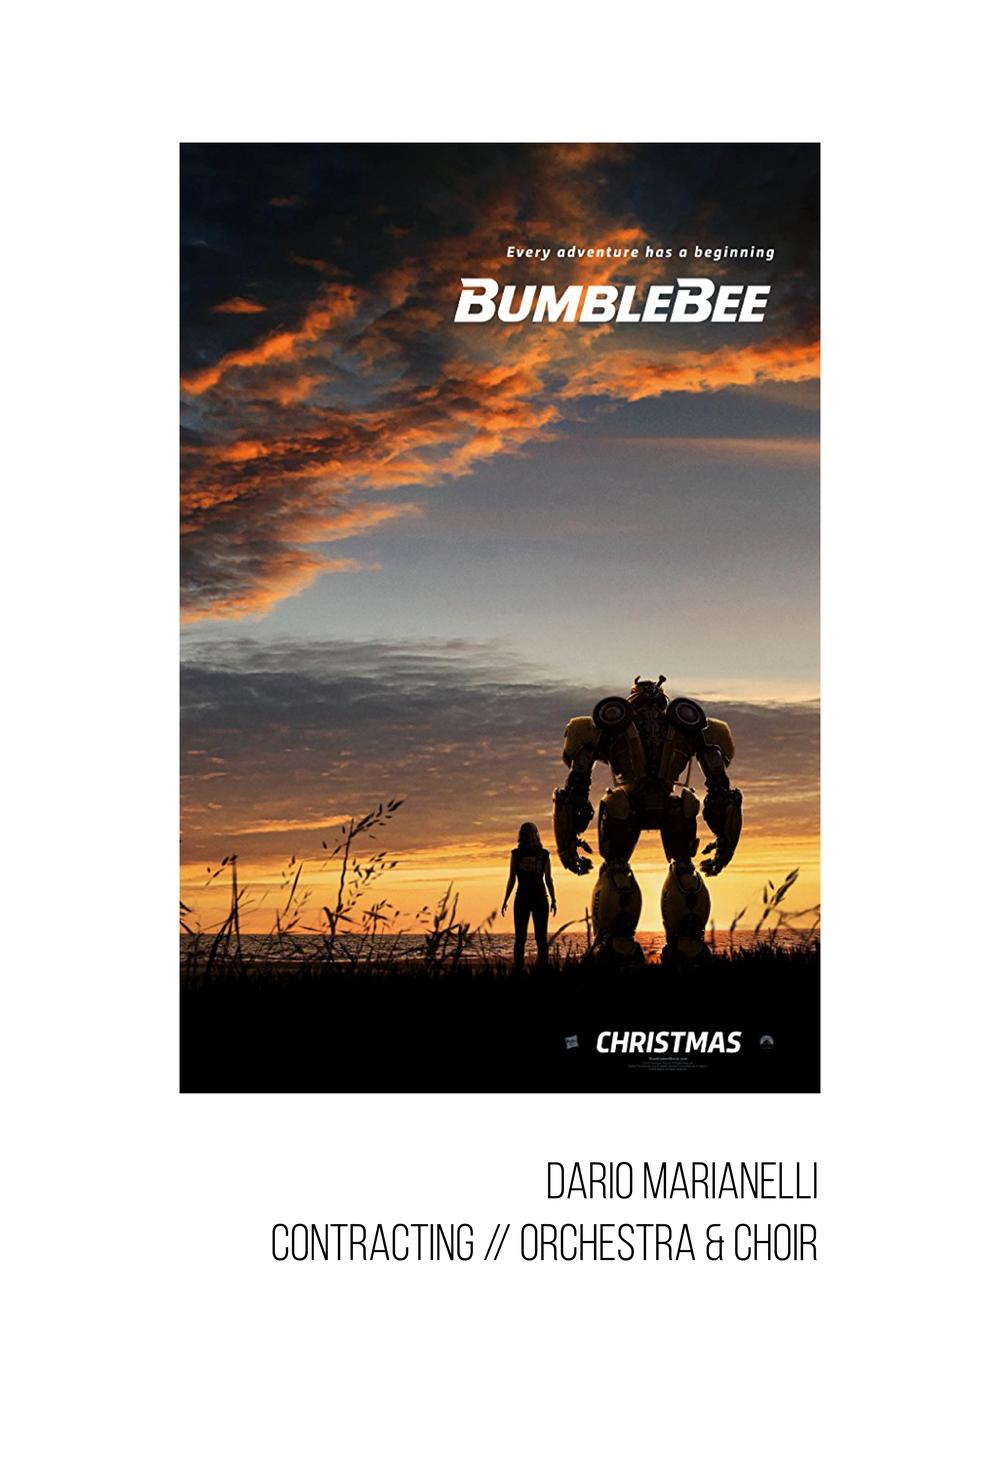 bumblebee-01.png